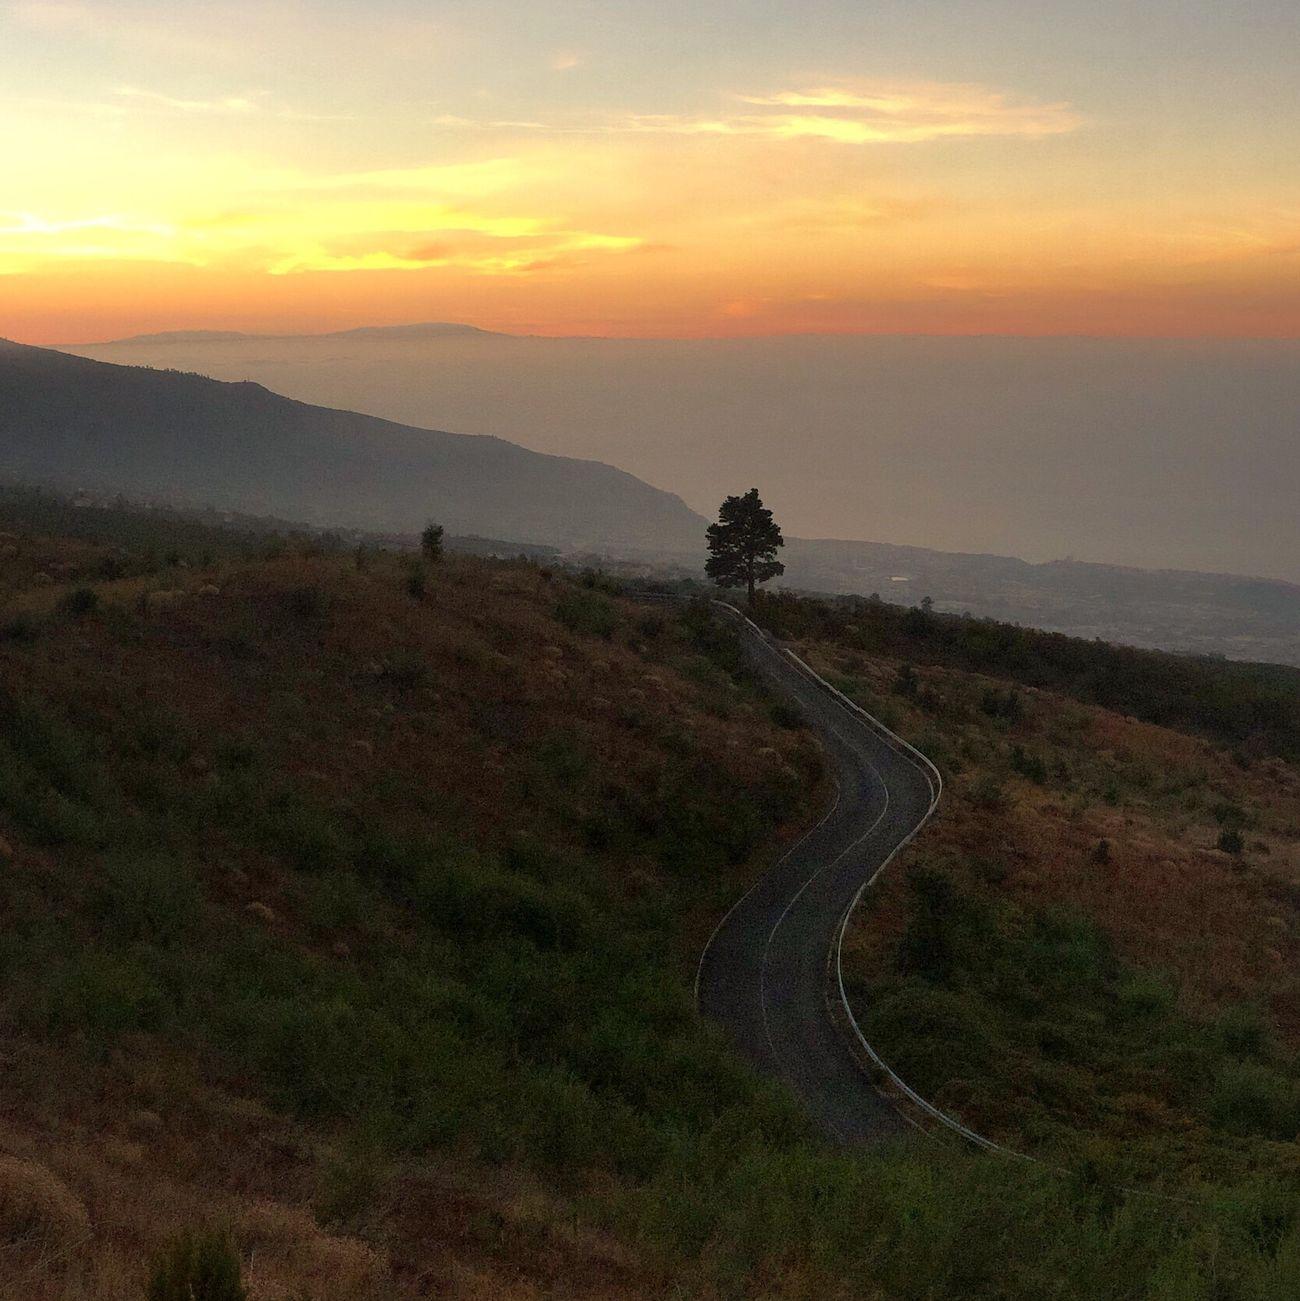 Sunset Landscape Tenerife Canary Islands Teneriffa Islas Canarias